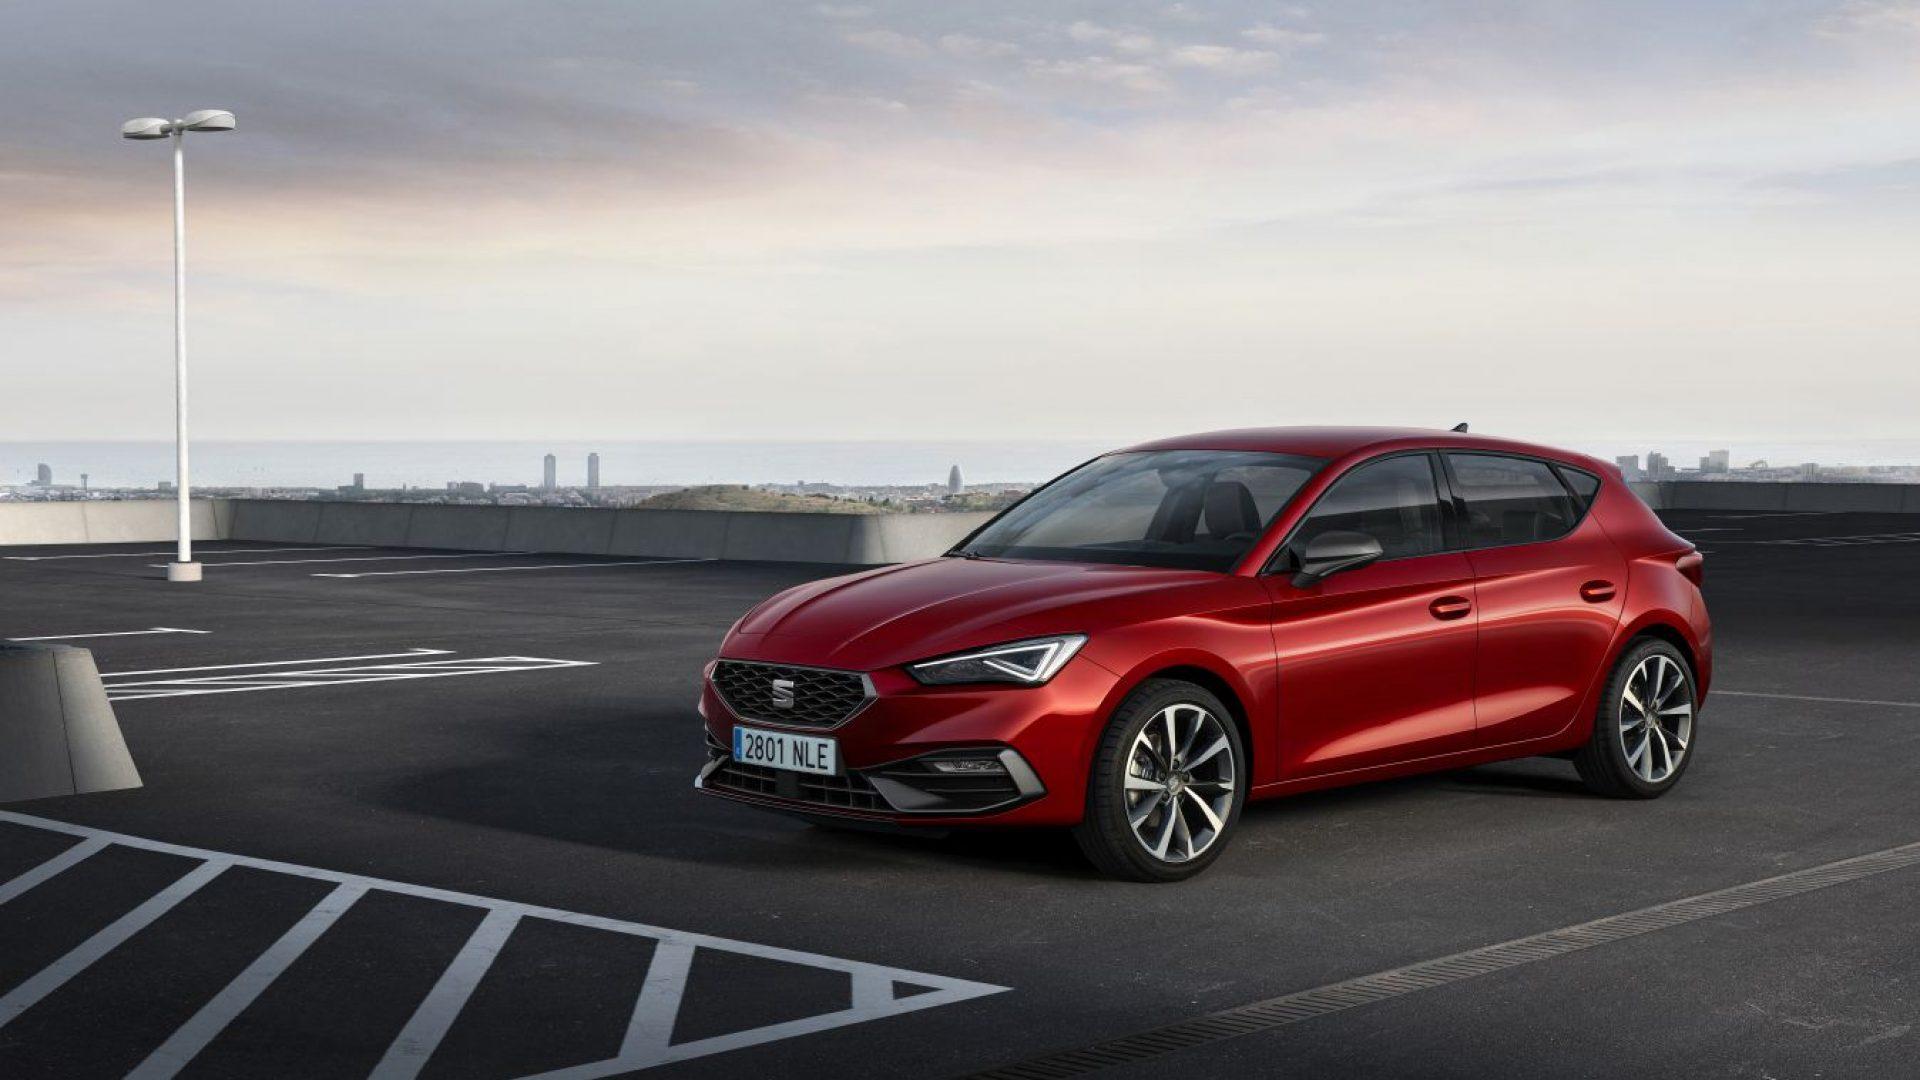 All-new-SEAT-Leon-5-doors_01_HQ